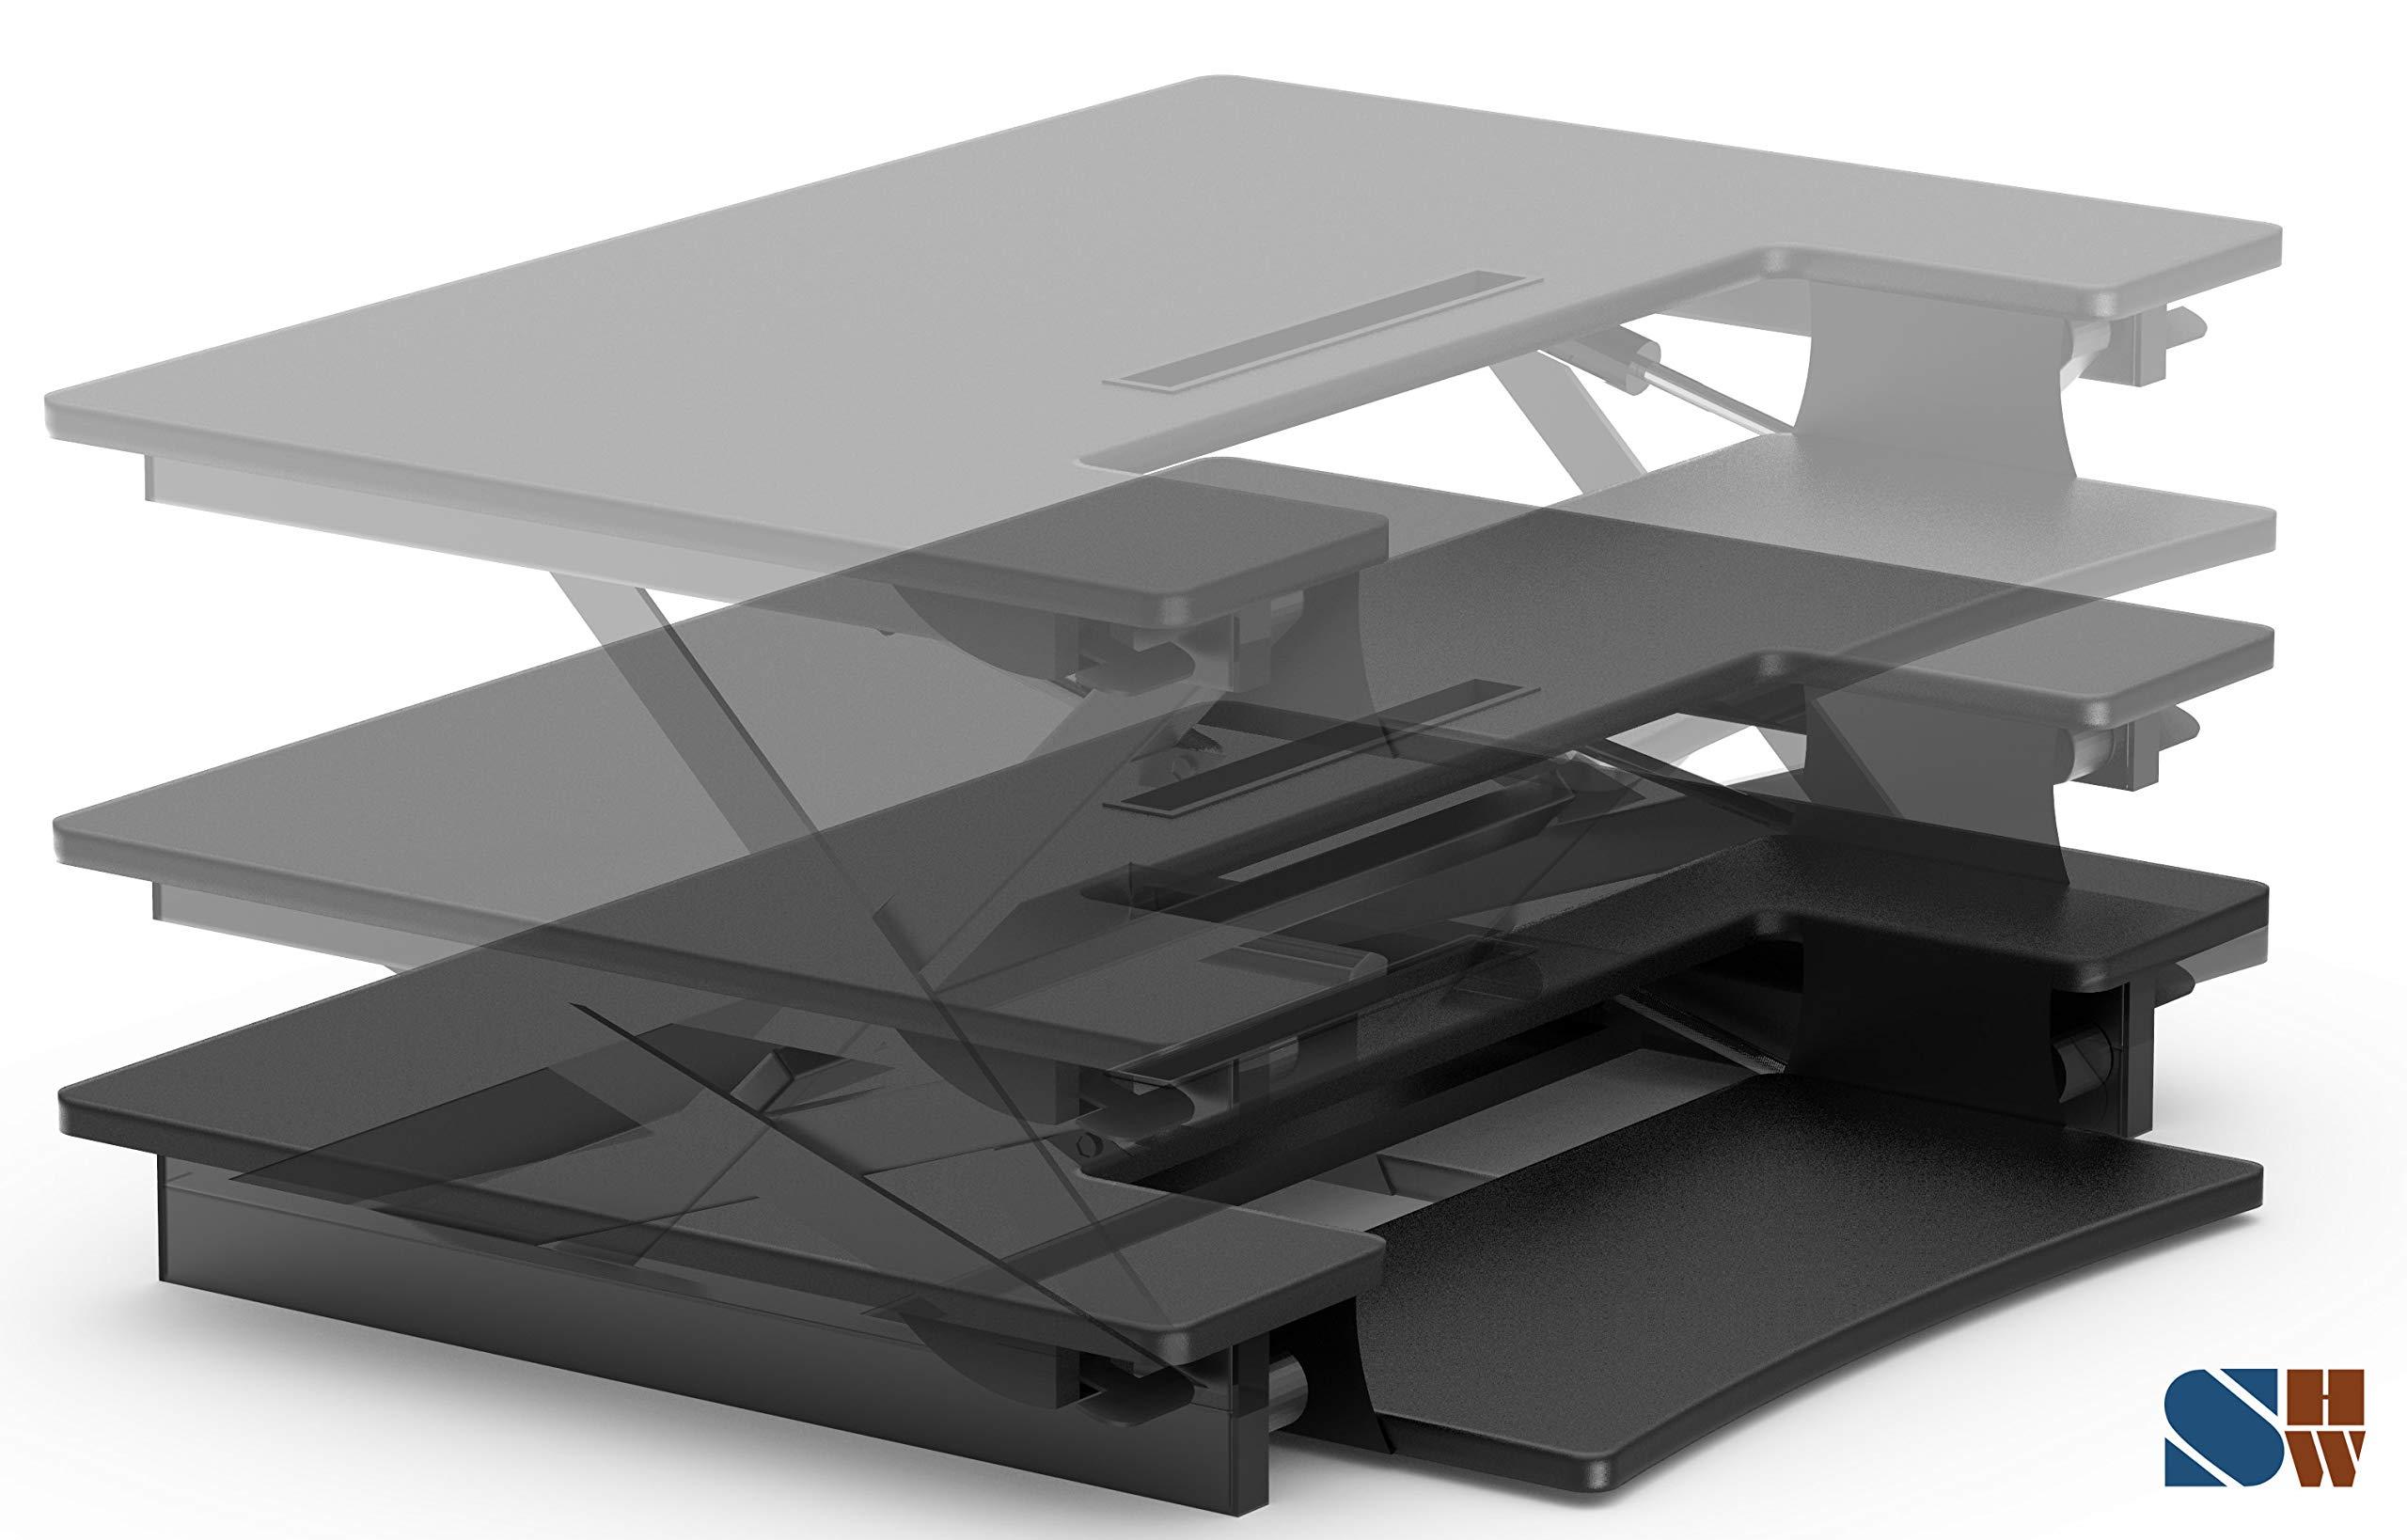 SHW Height Adjustable Sit to Stand Desk Riser Converter Workstation, Black by SHW (Image #5)